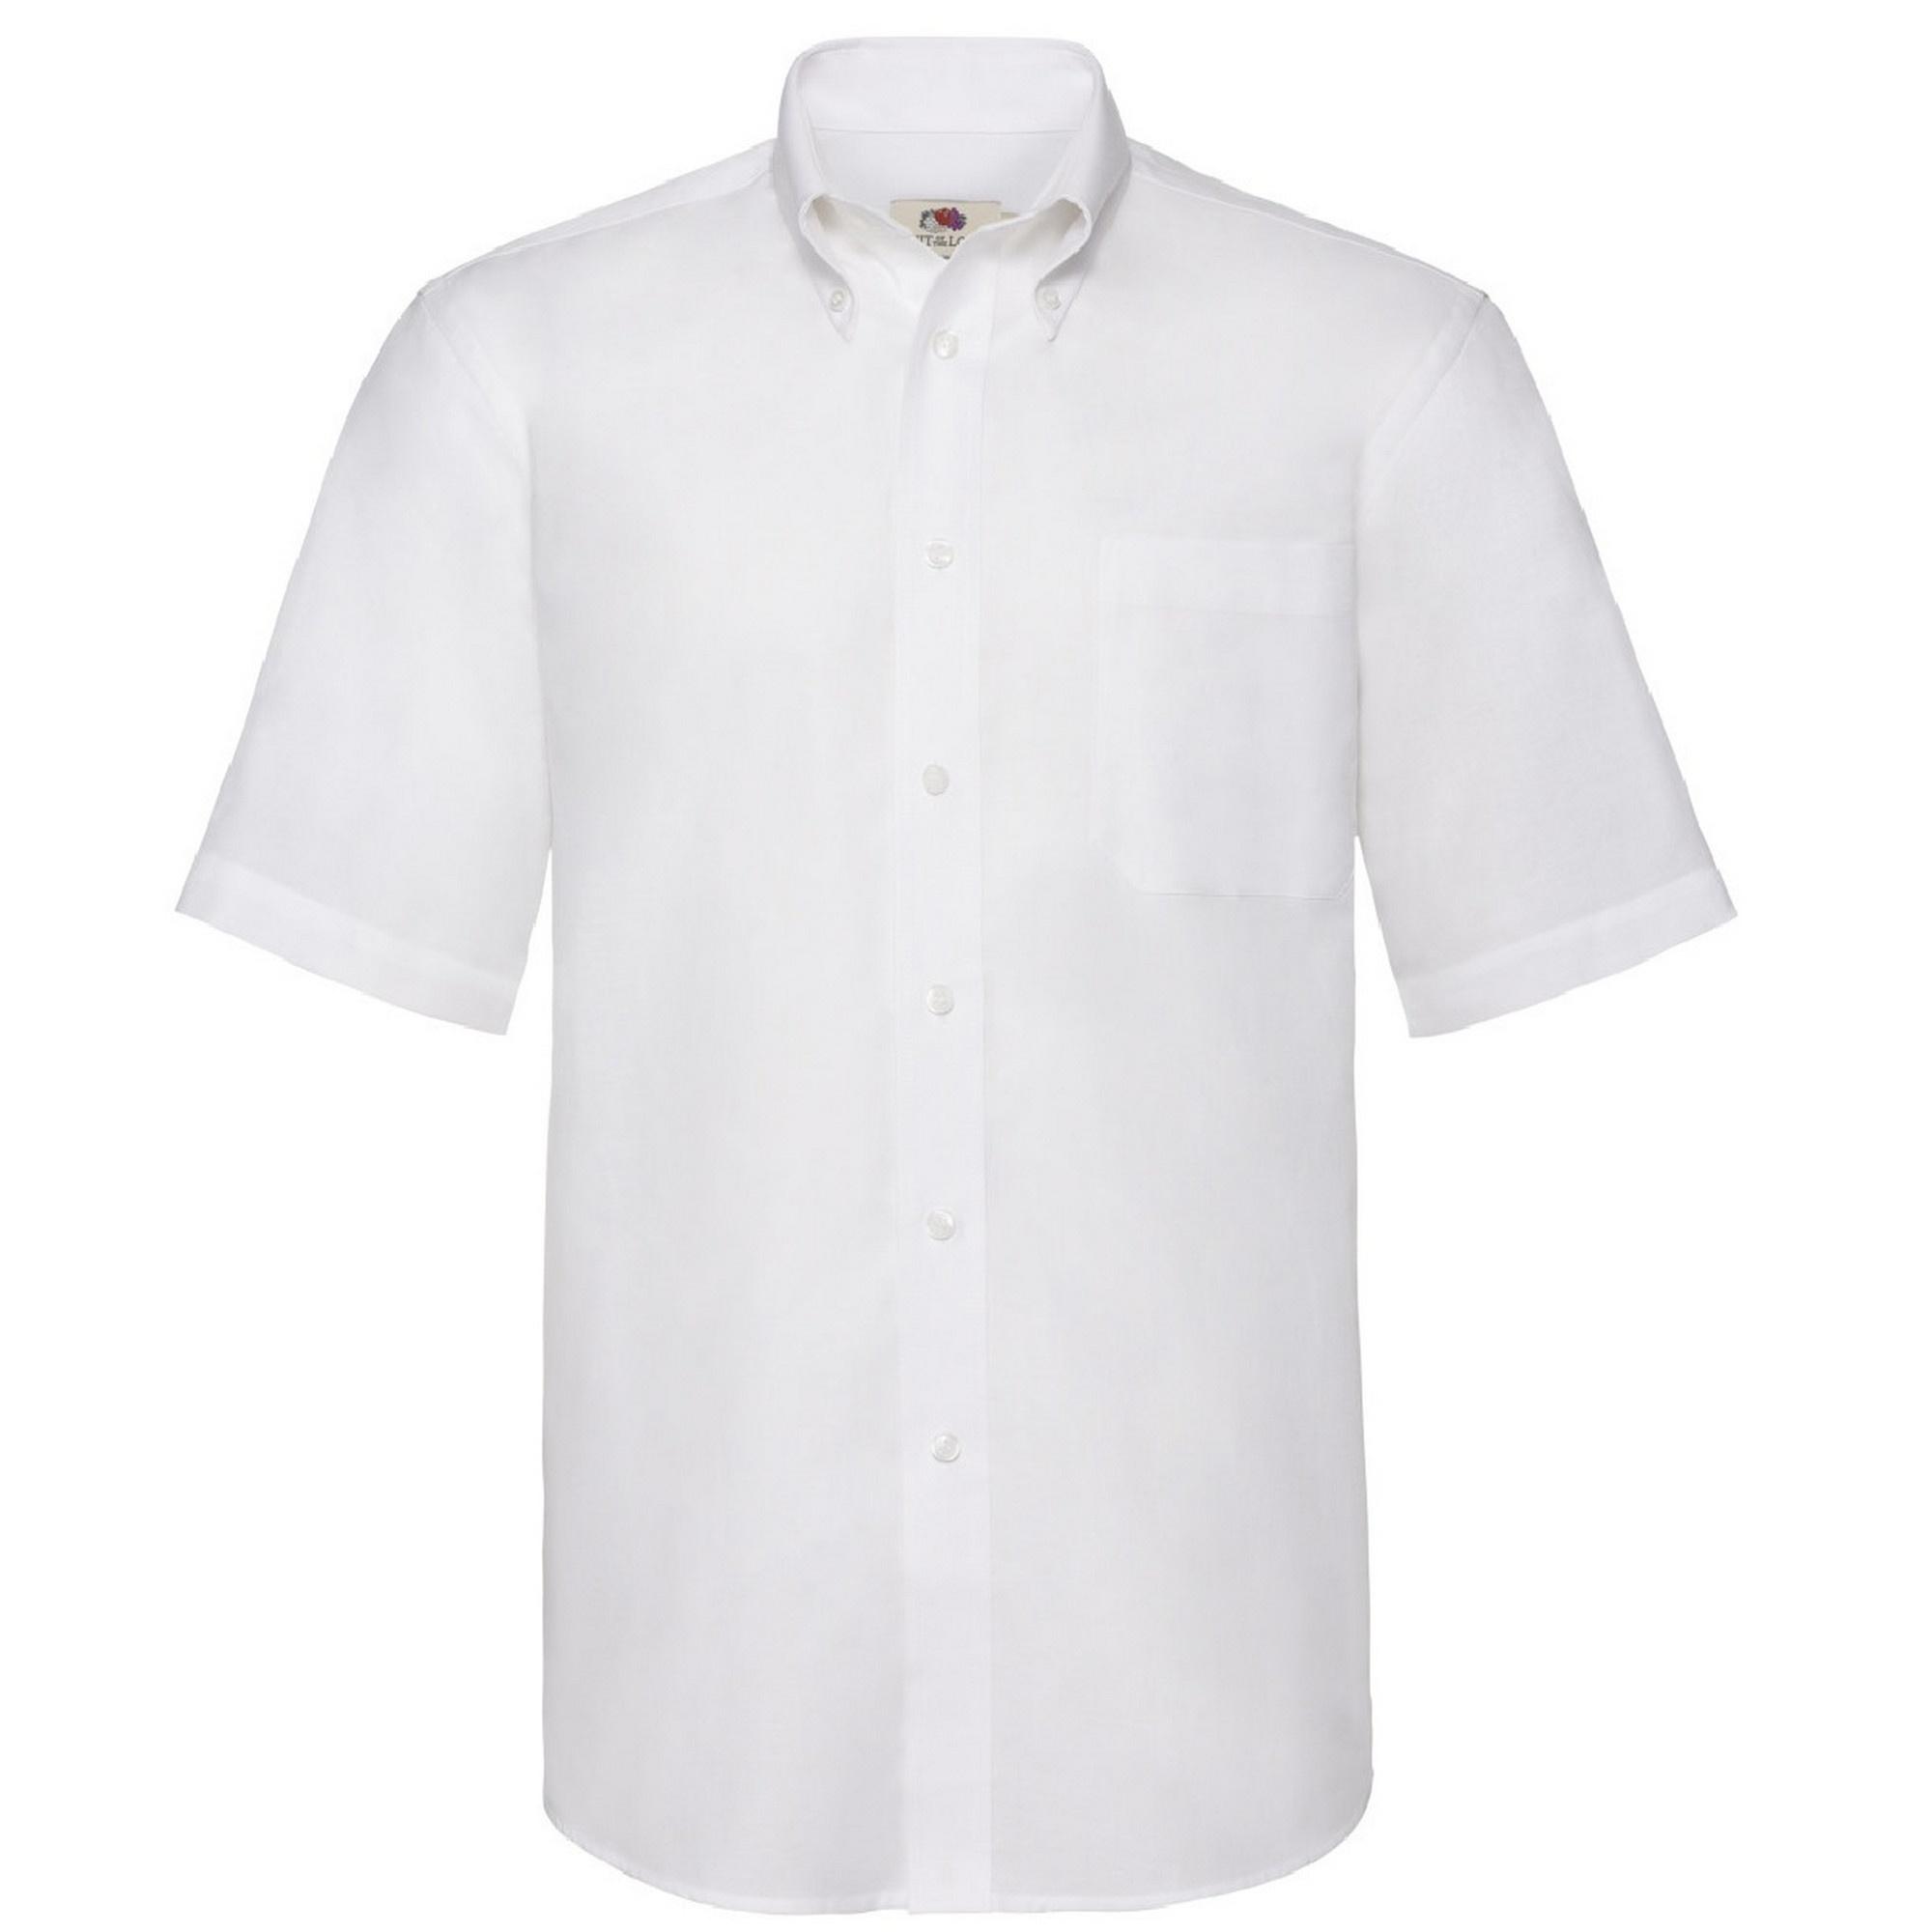 Fruit Of The Loom Mens Short Sleeve Oxford Shirt (L) (White)